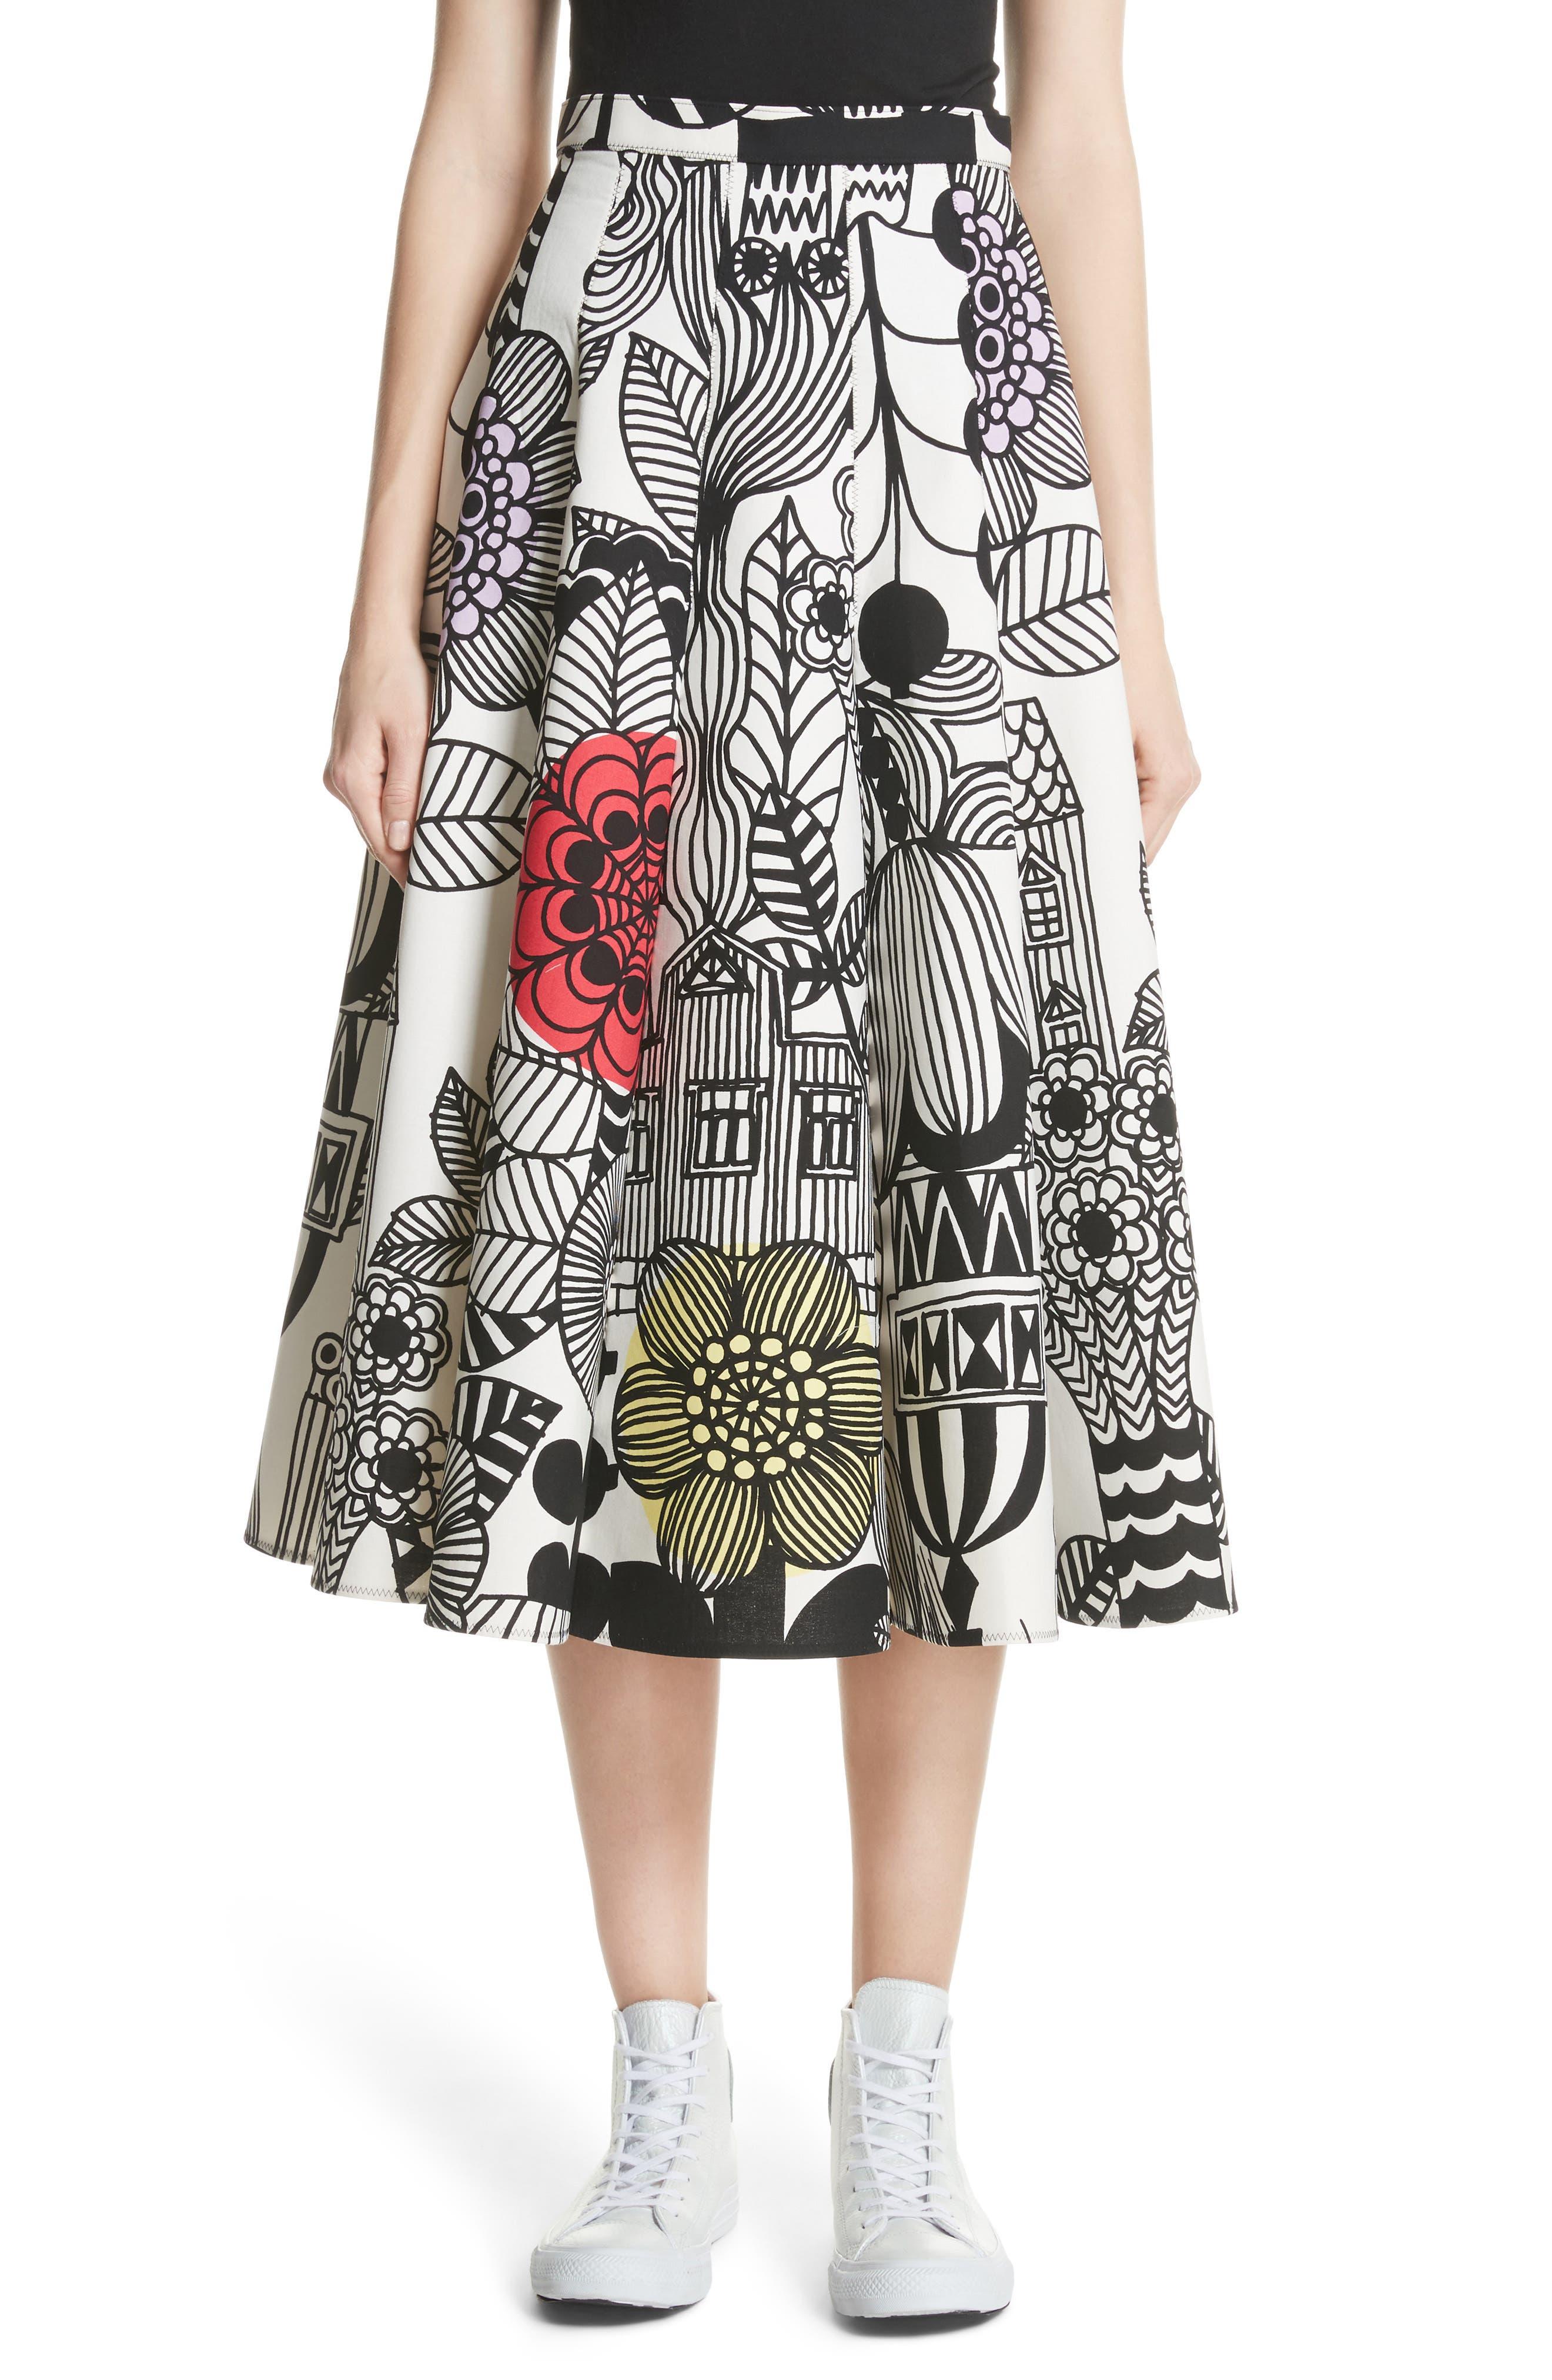 x Marimekko Vegetable Print Cotton Skirt,                         Main,                         color, Wht/ Blk/ Ylw